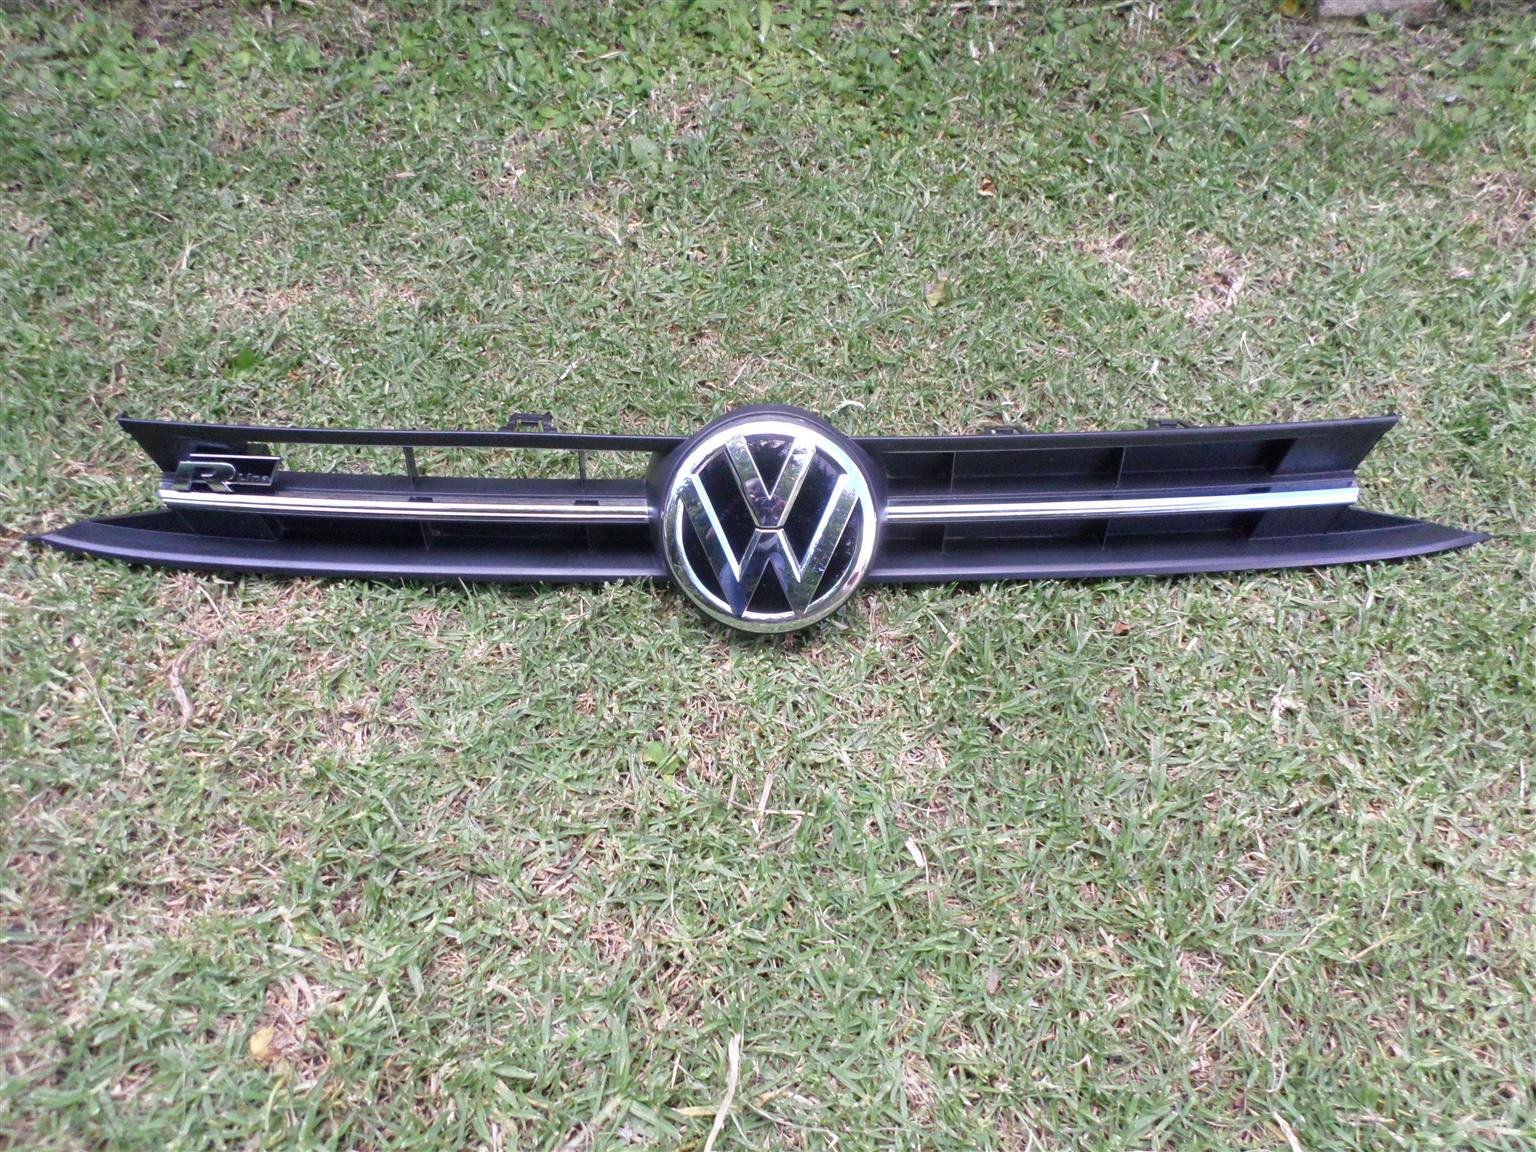 2021 VW POLO 8 R-LINE COMPLETE MAIN BUMPER GRILL FOR SALE